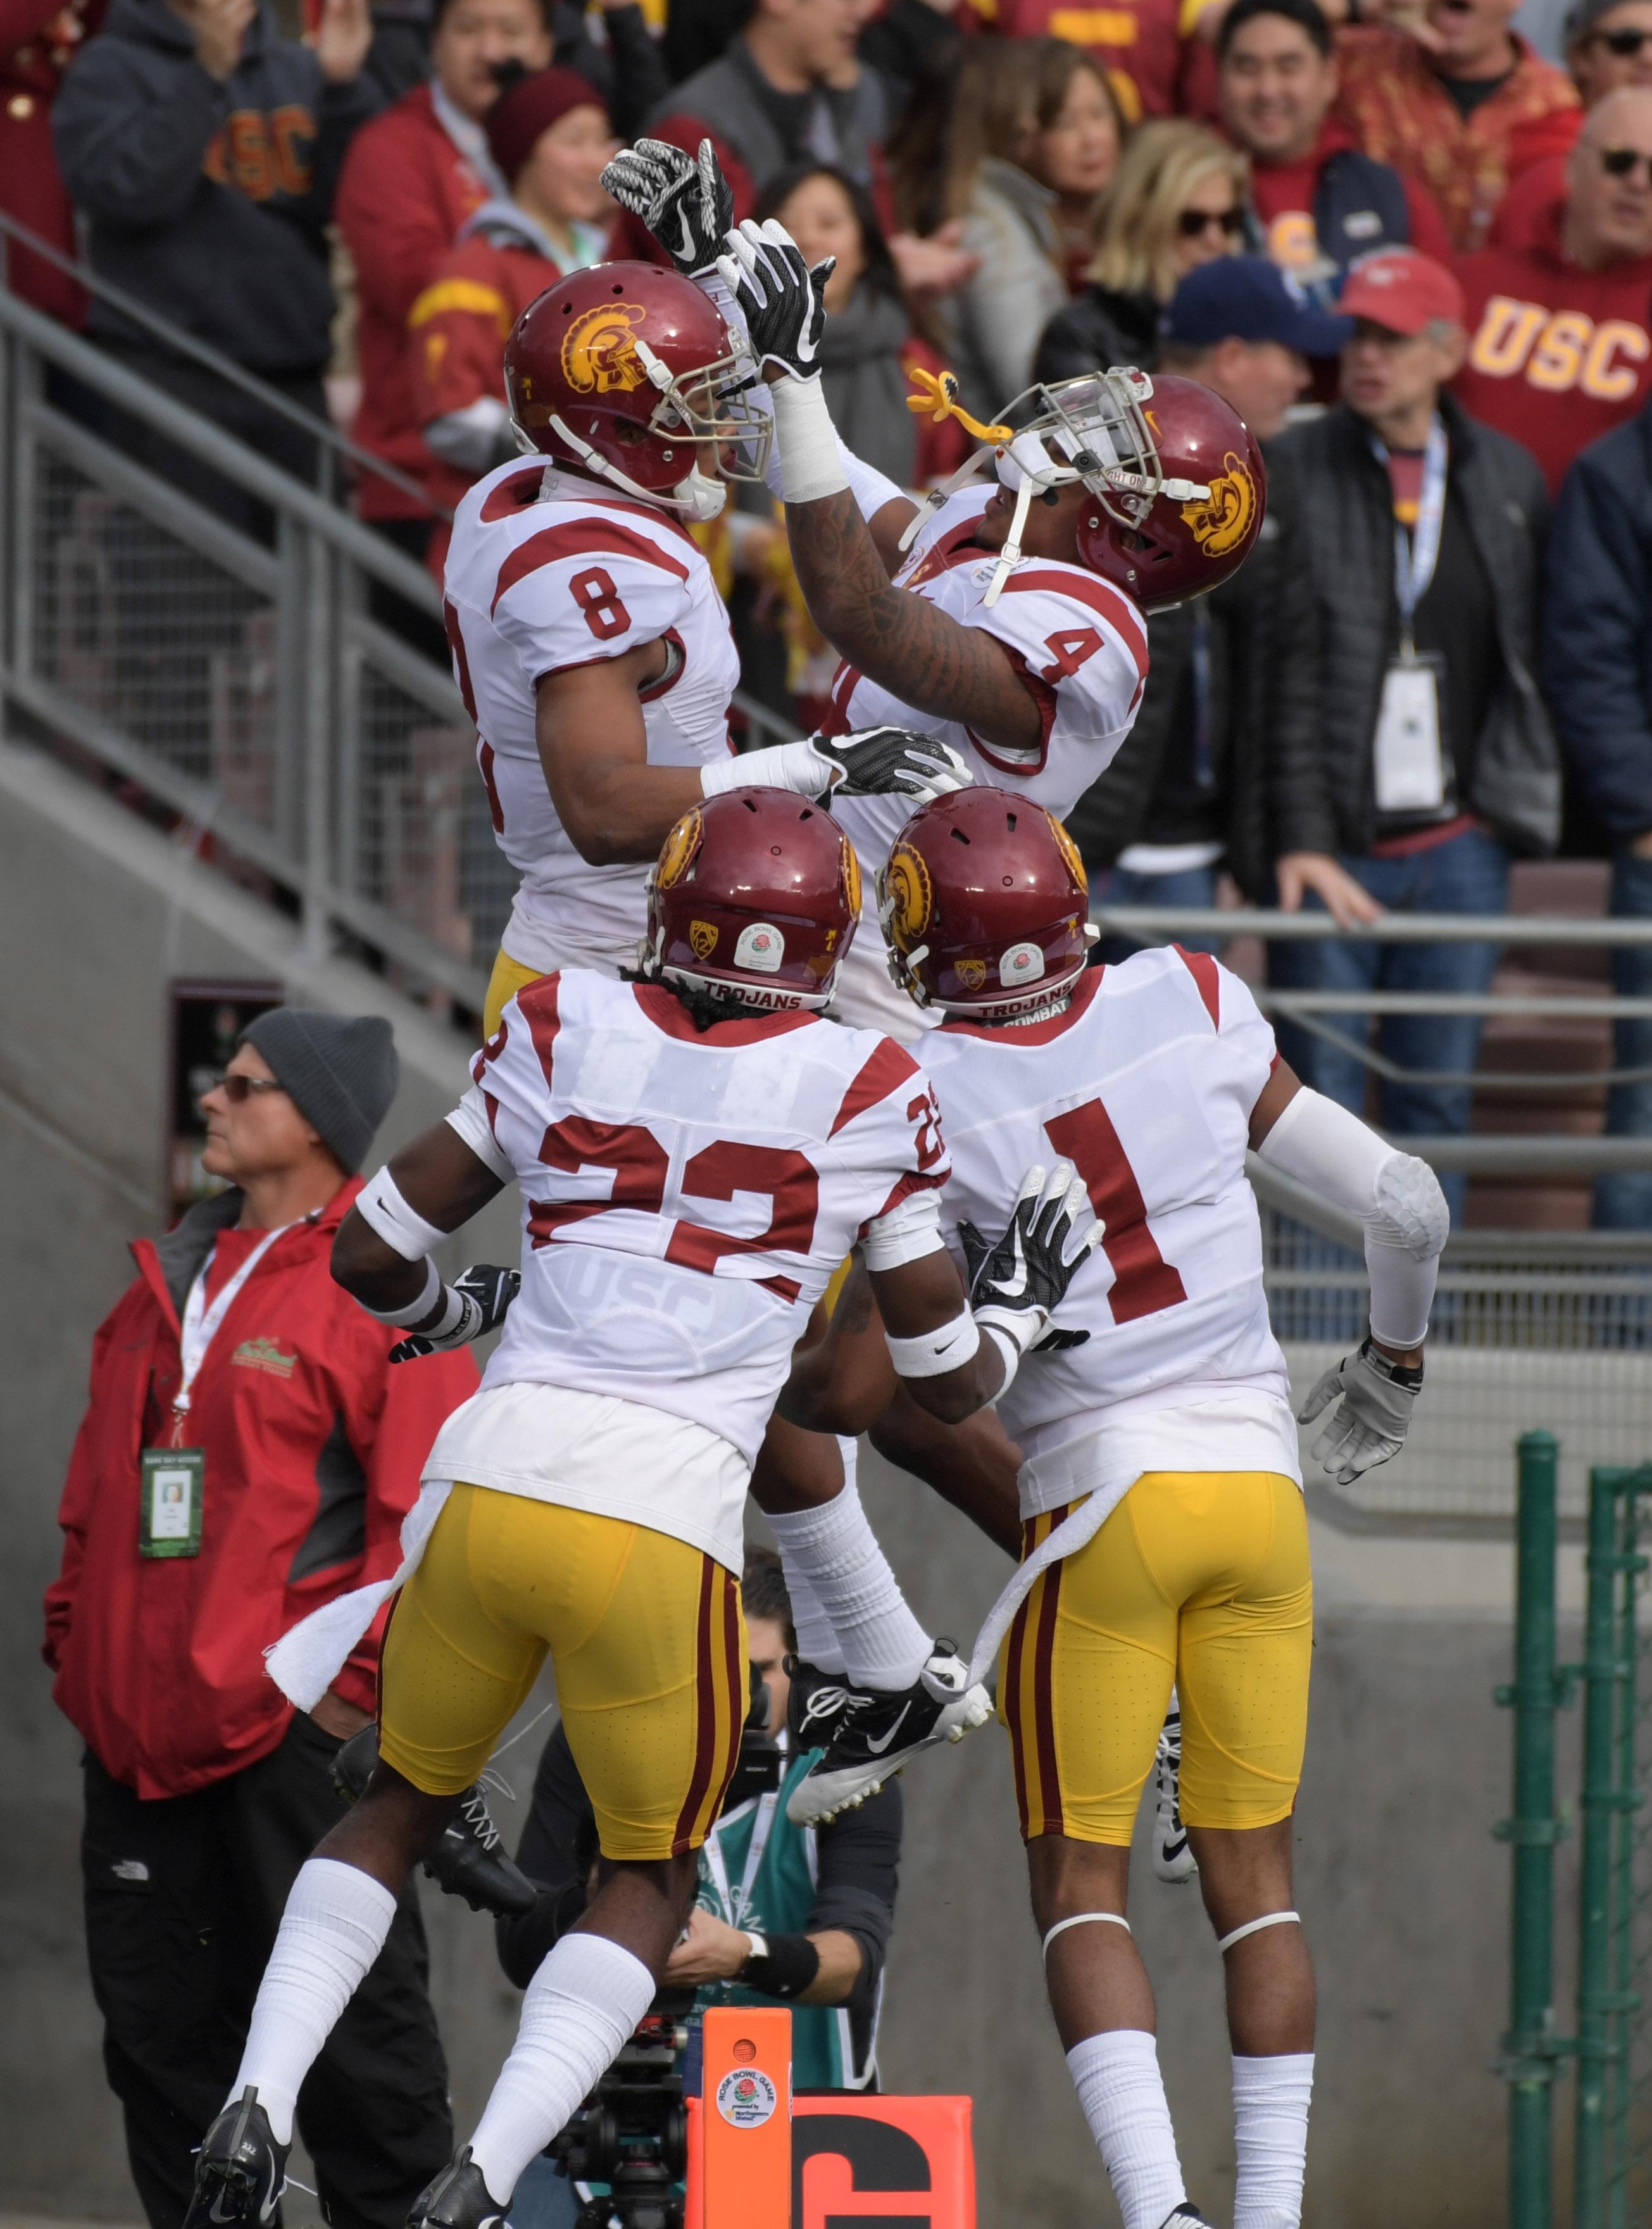 NCAA Football: Rose Bowl Game-Penn State vs Southern California